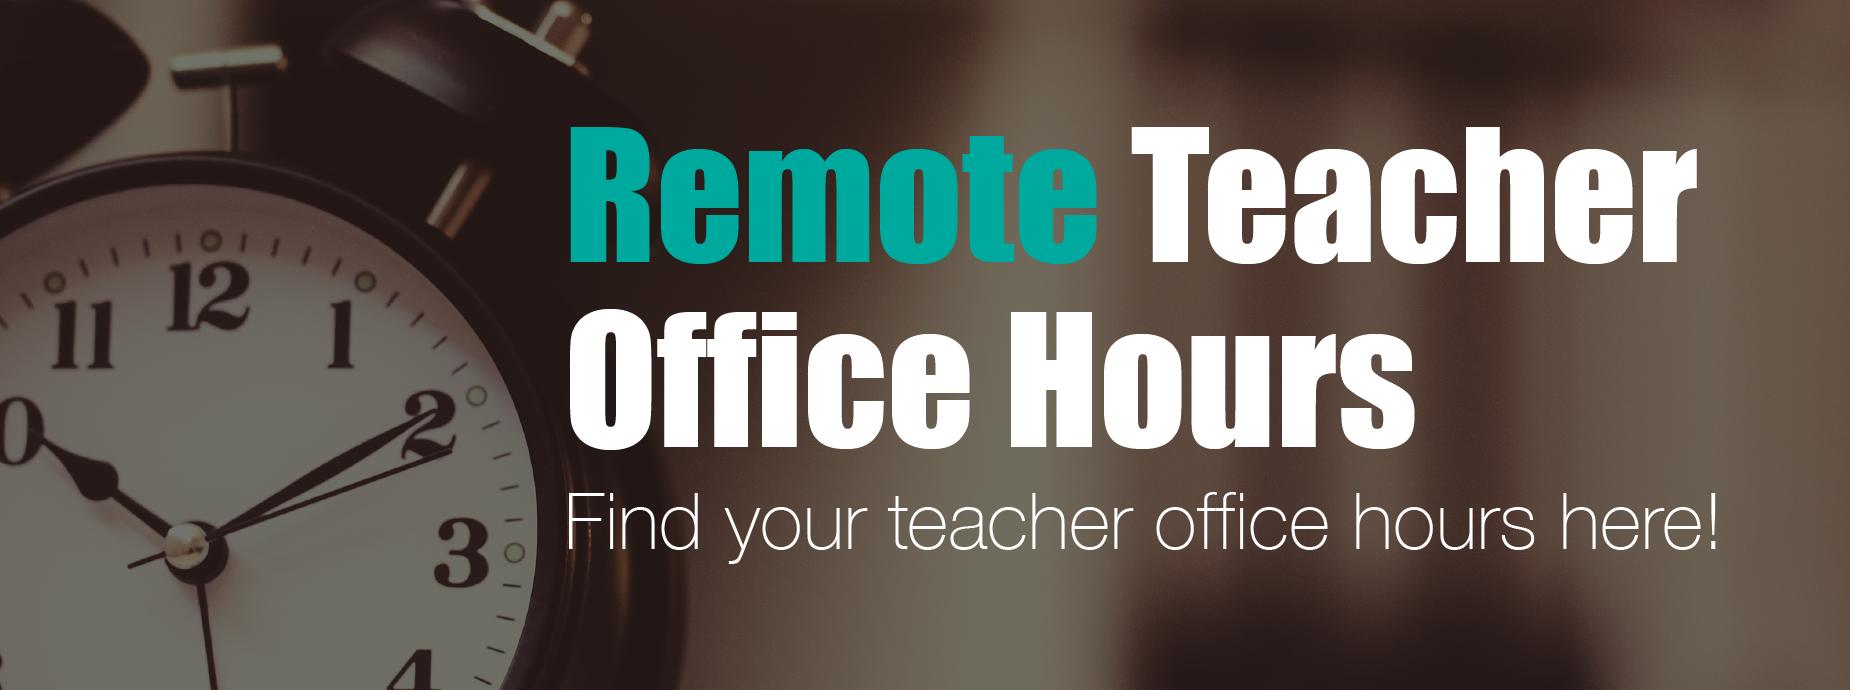 Remote Teacher Office Hours Banner